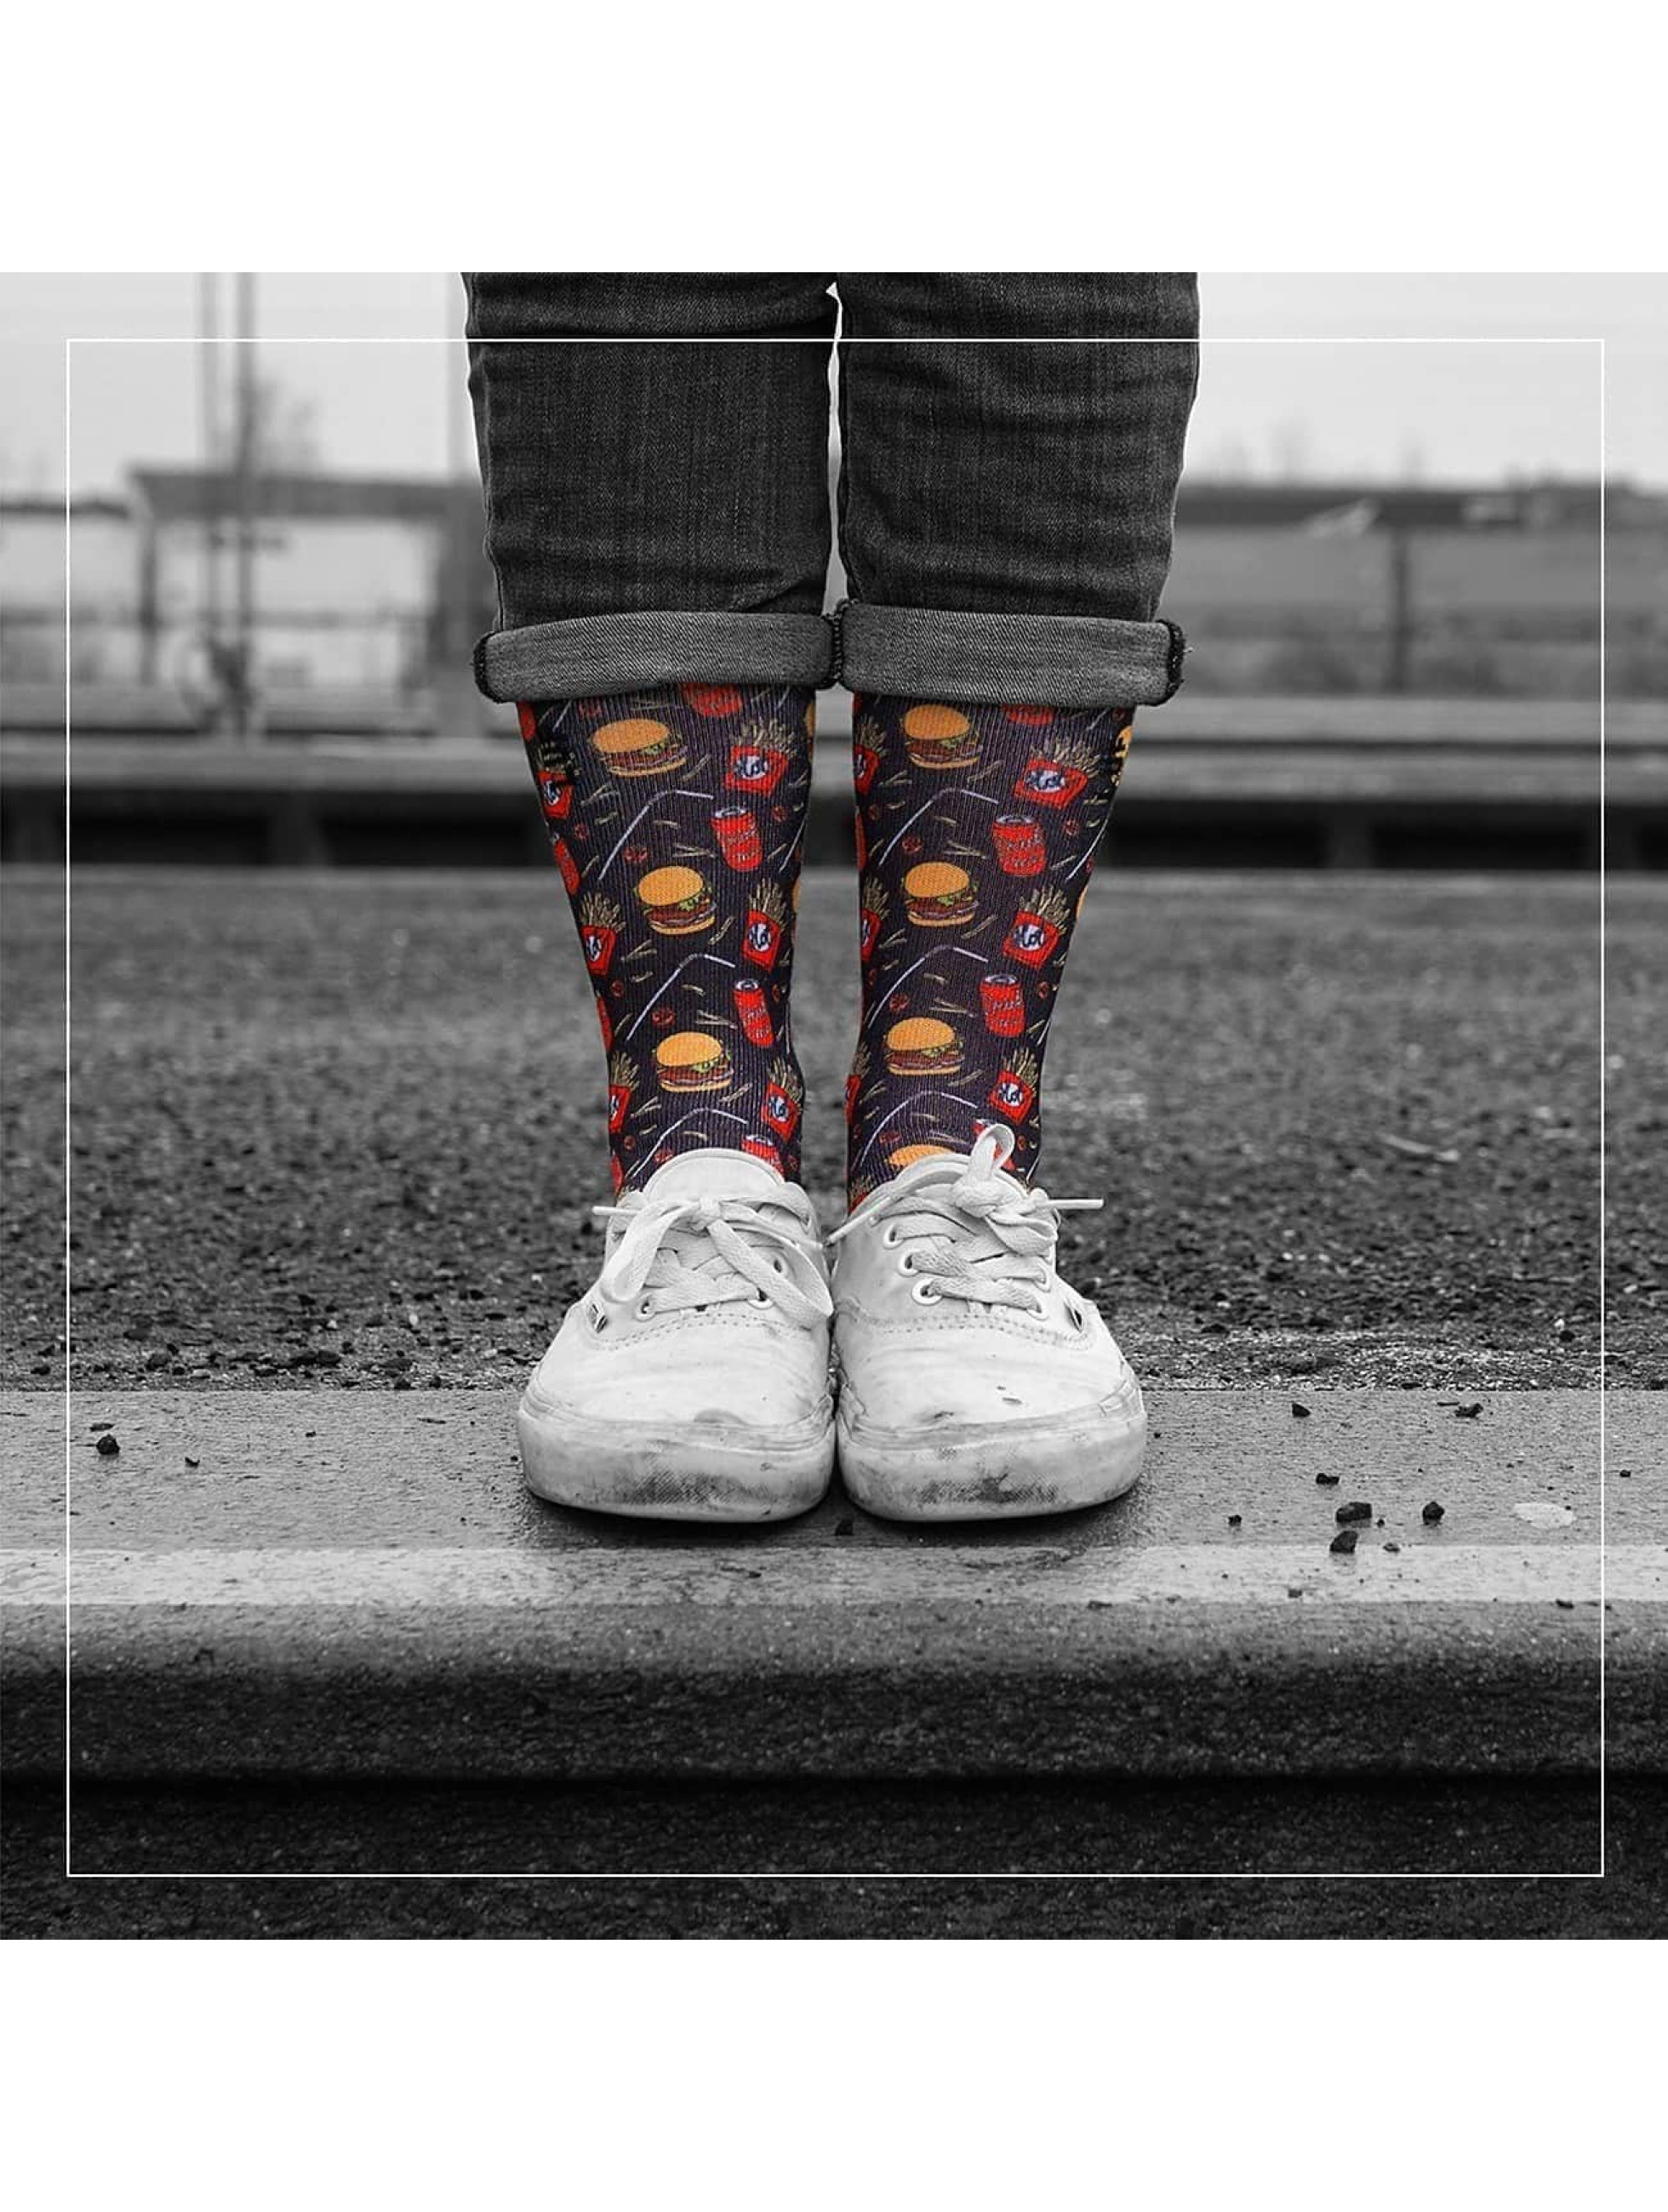 LUF SOX Socks King Menu colored